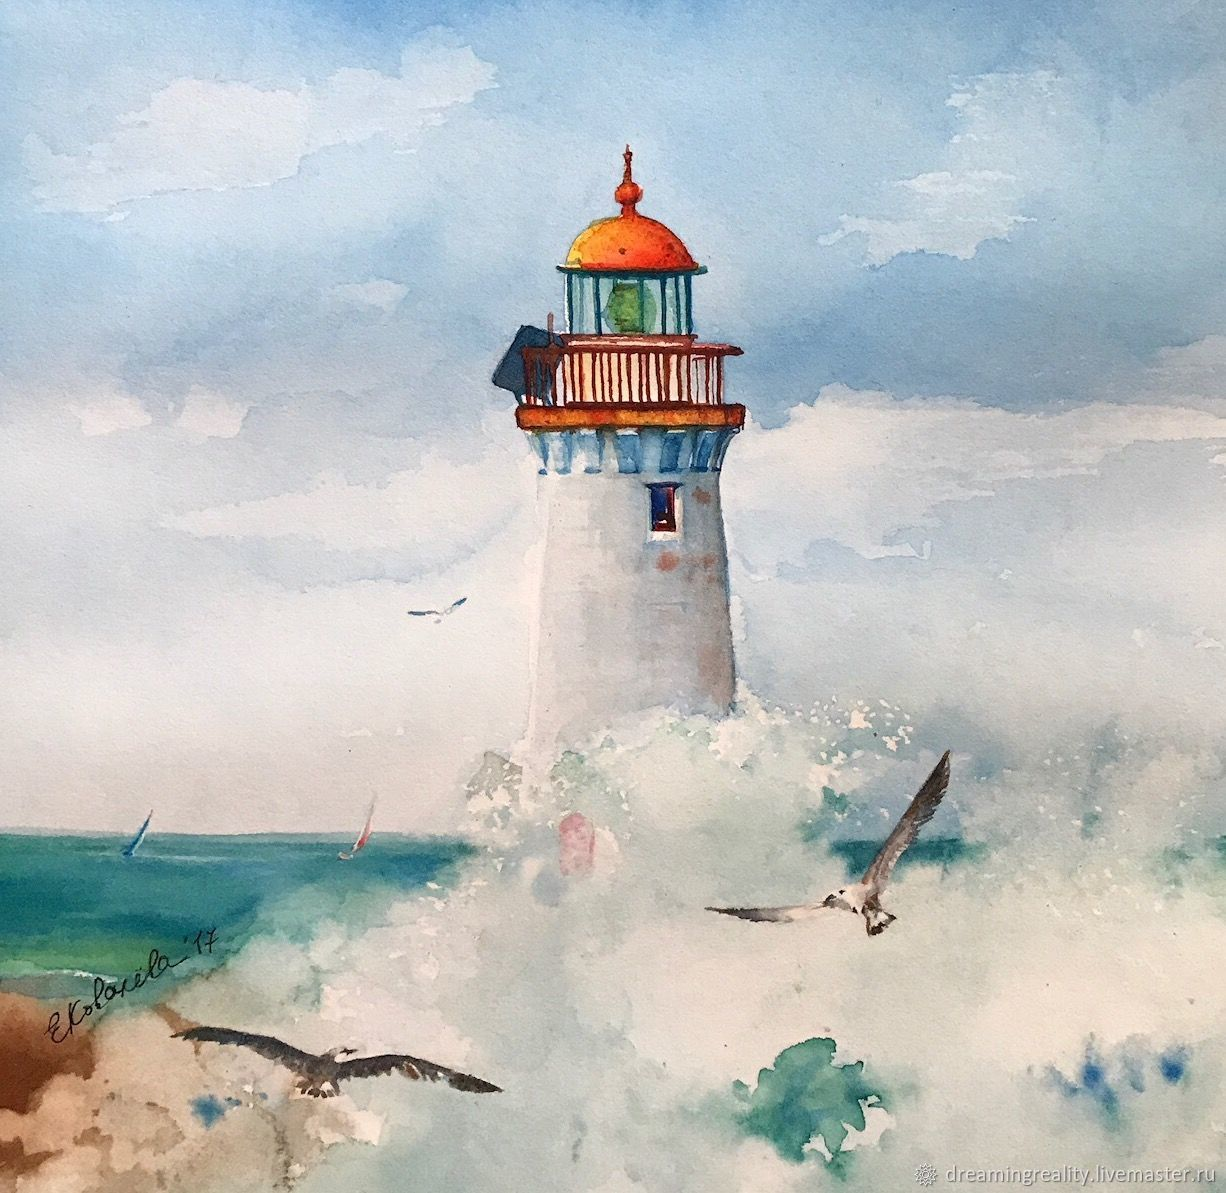 постер море с маяком карликовая планета